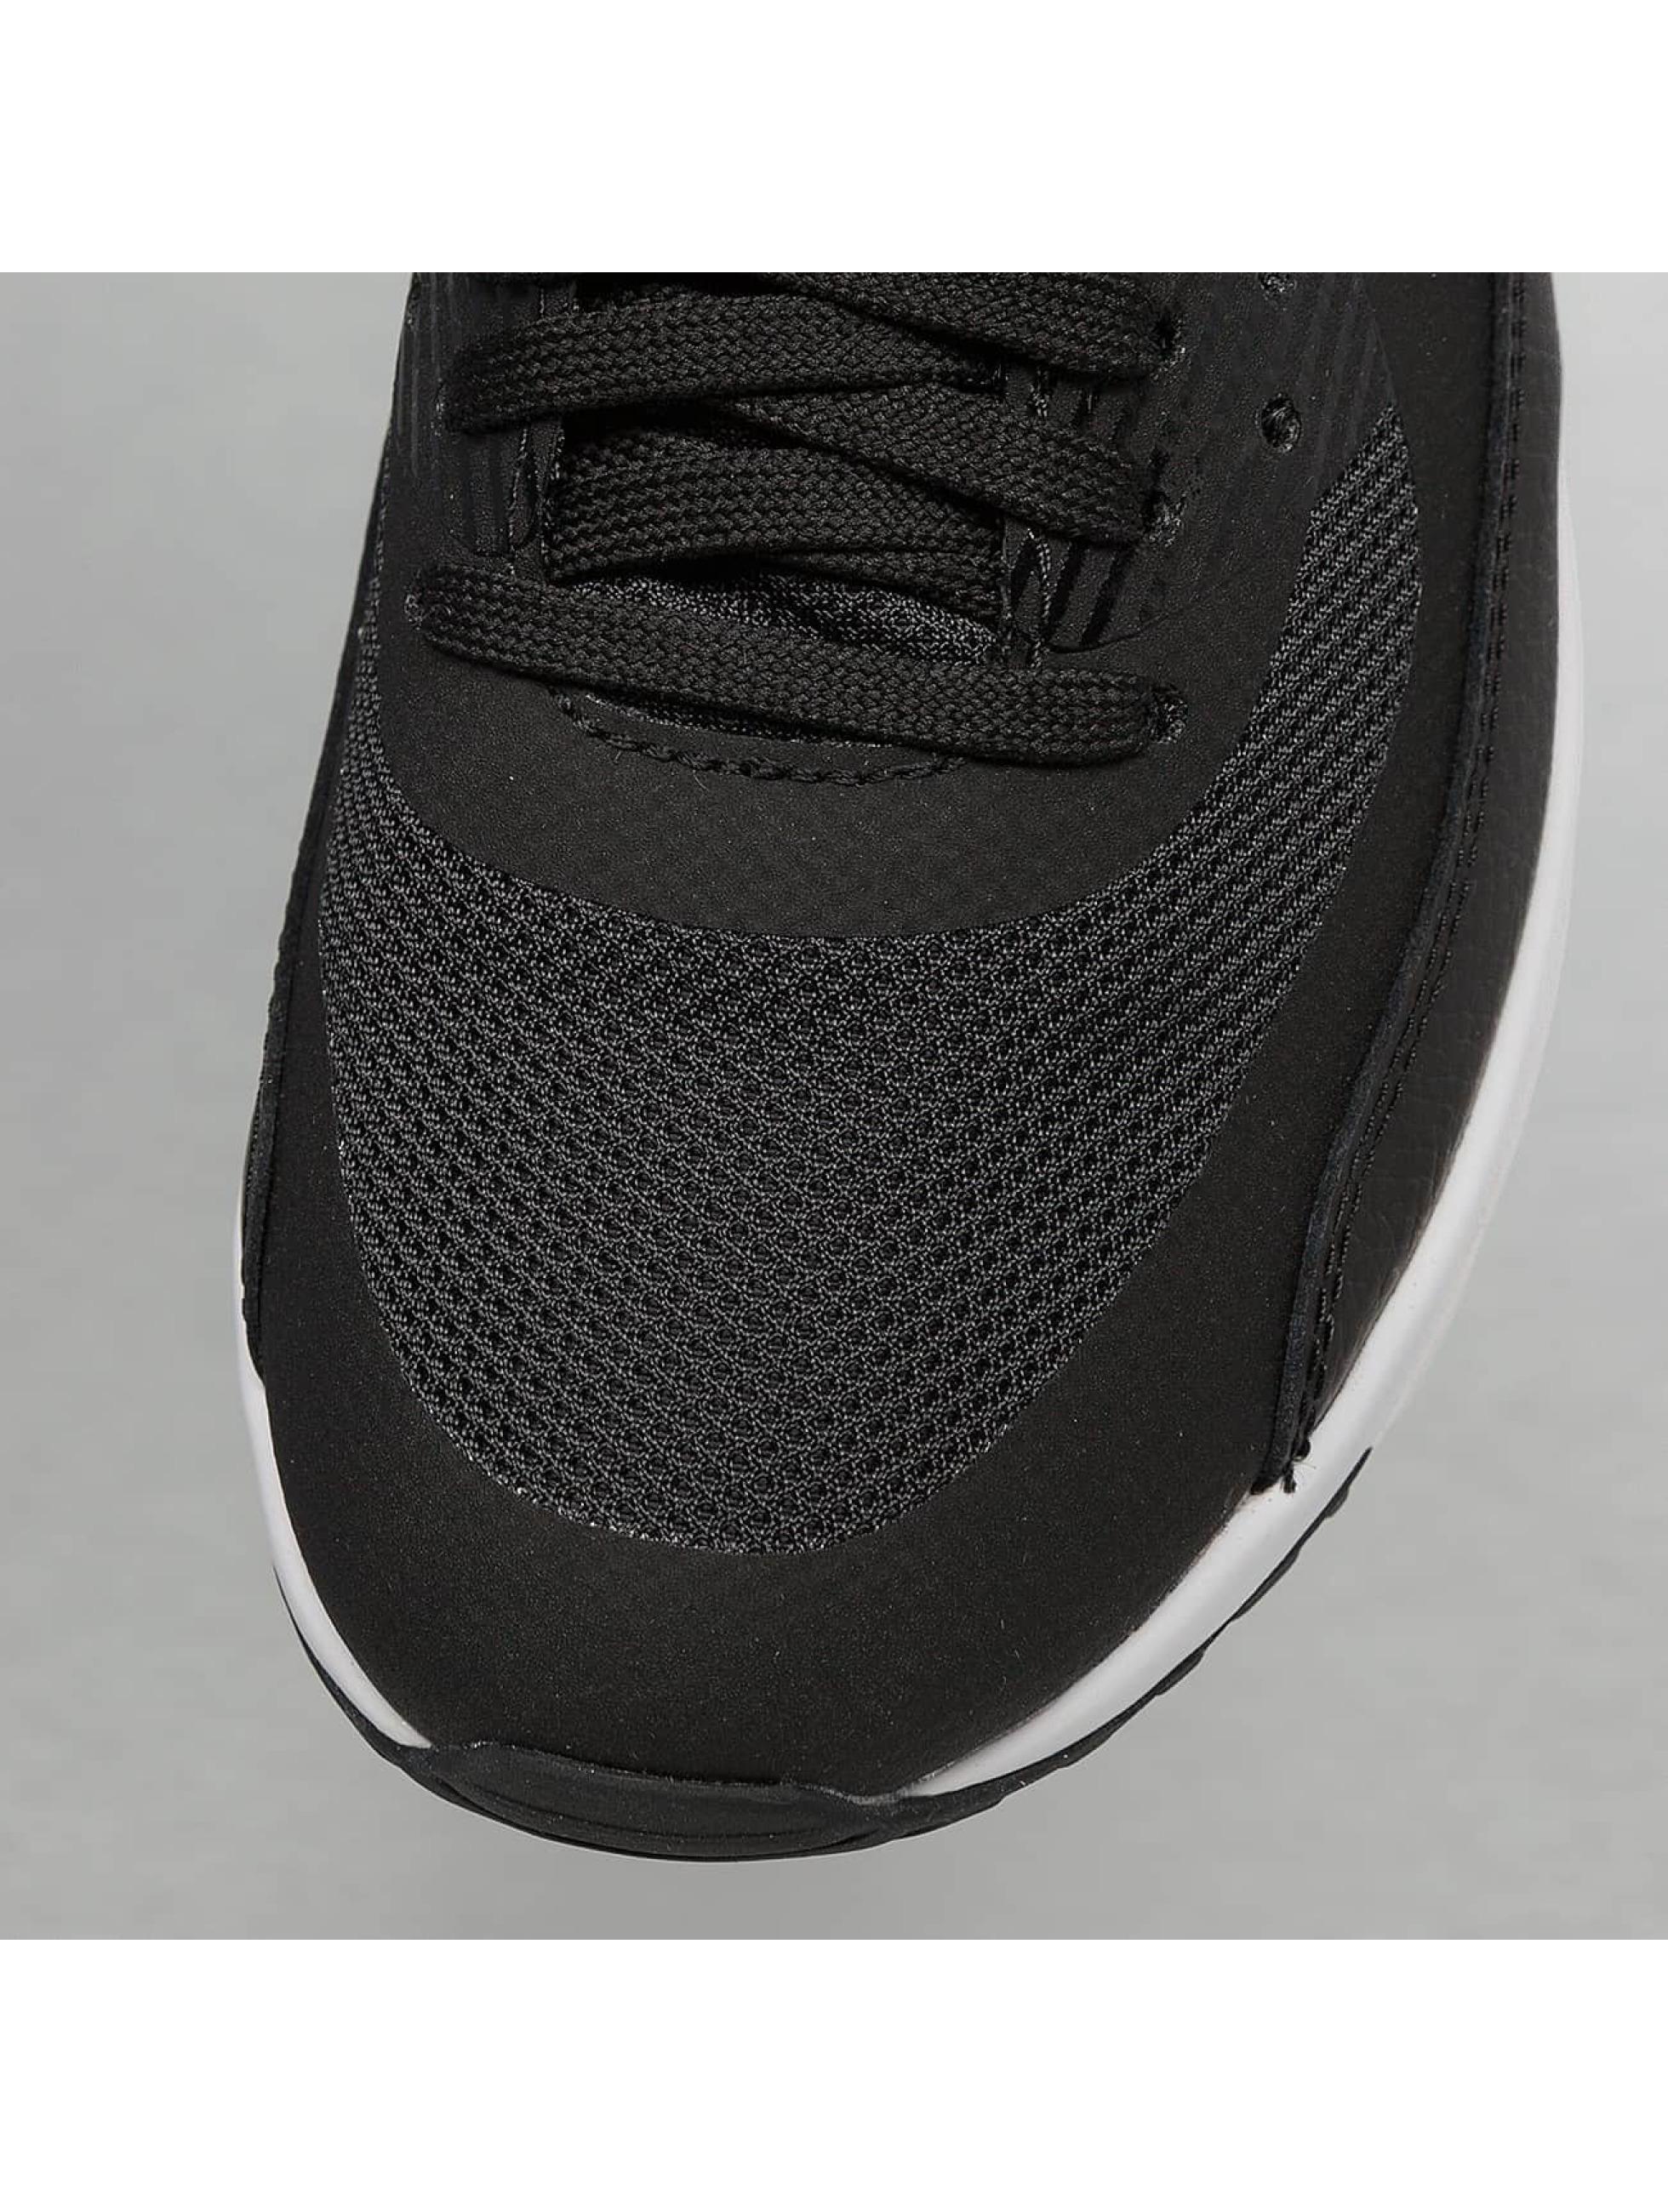 Nike Zapatillas de deporte W Air Max 90 Ultra 2.0 negro